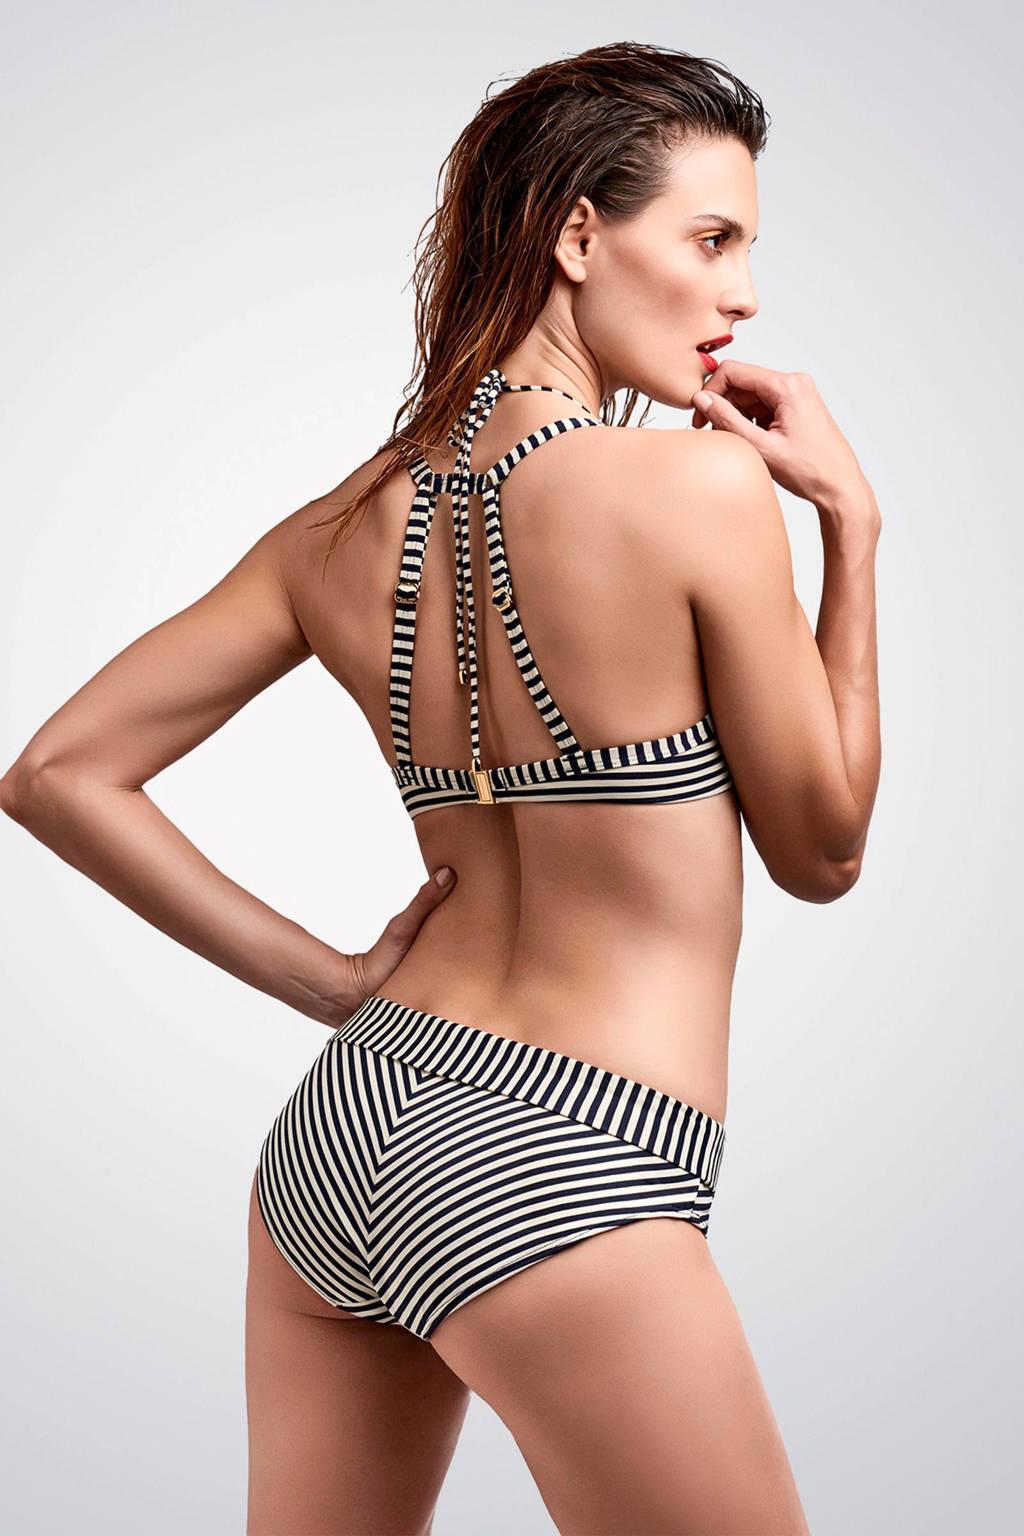 Dekkersomslag Bikini Dekkersomslag Dekkersomslag Broekje Bikini Broekje Broekje Bikini Dekkersomslag Dekkersomslag Bikini Marlies Broekje Marlies Marlies Marlies Bikini Marlies w7rwUf